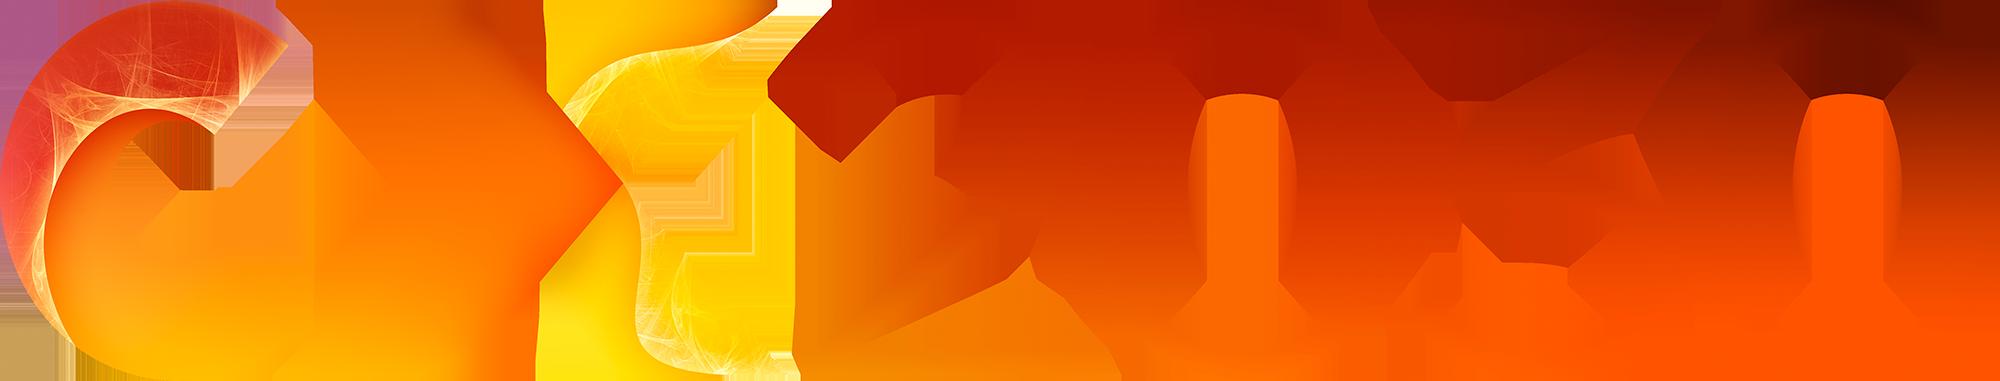 CX2030 logo horizontal 2K.png